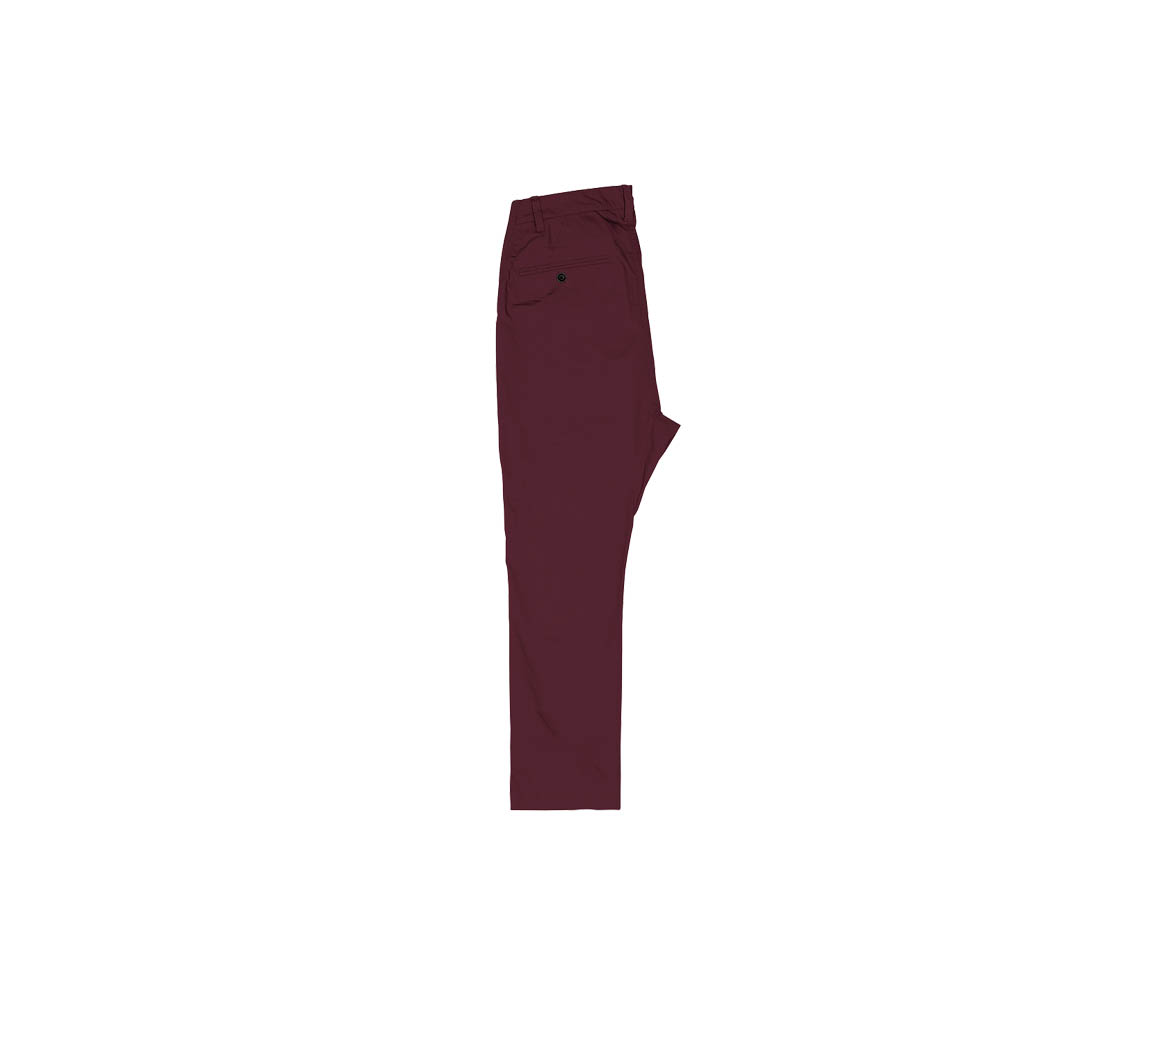 Pantalon chino en coton bio Sundsvall Chinos